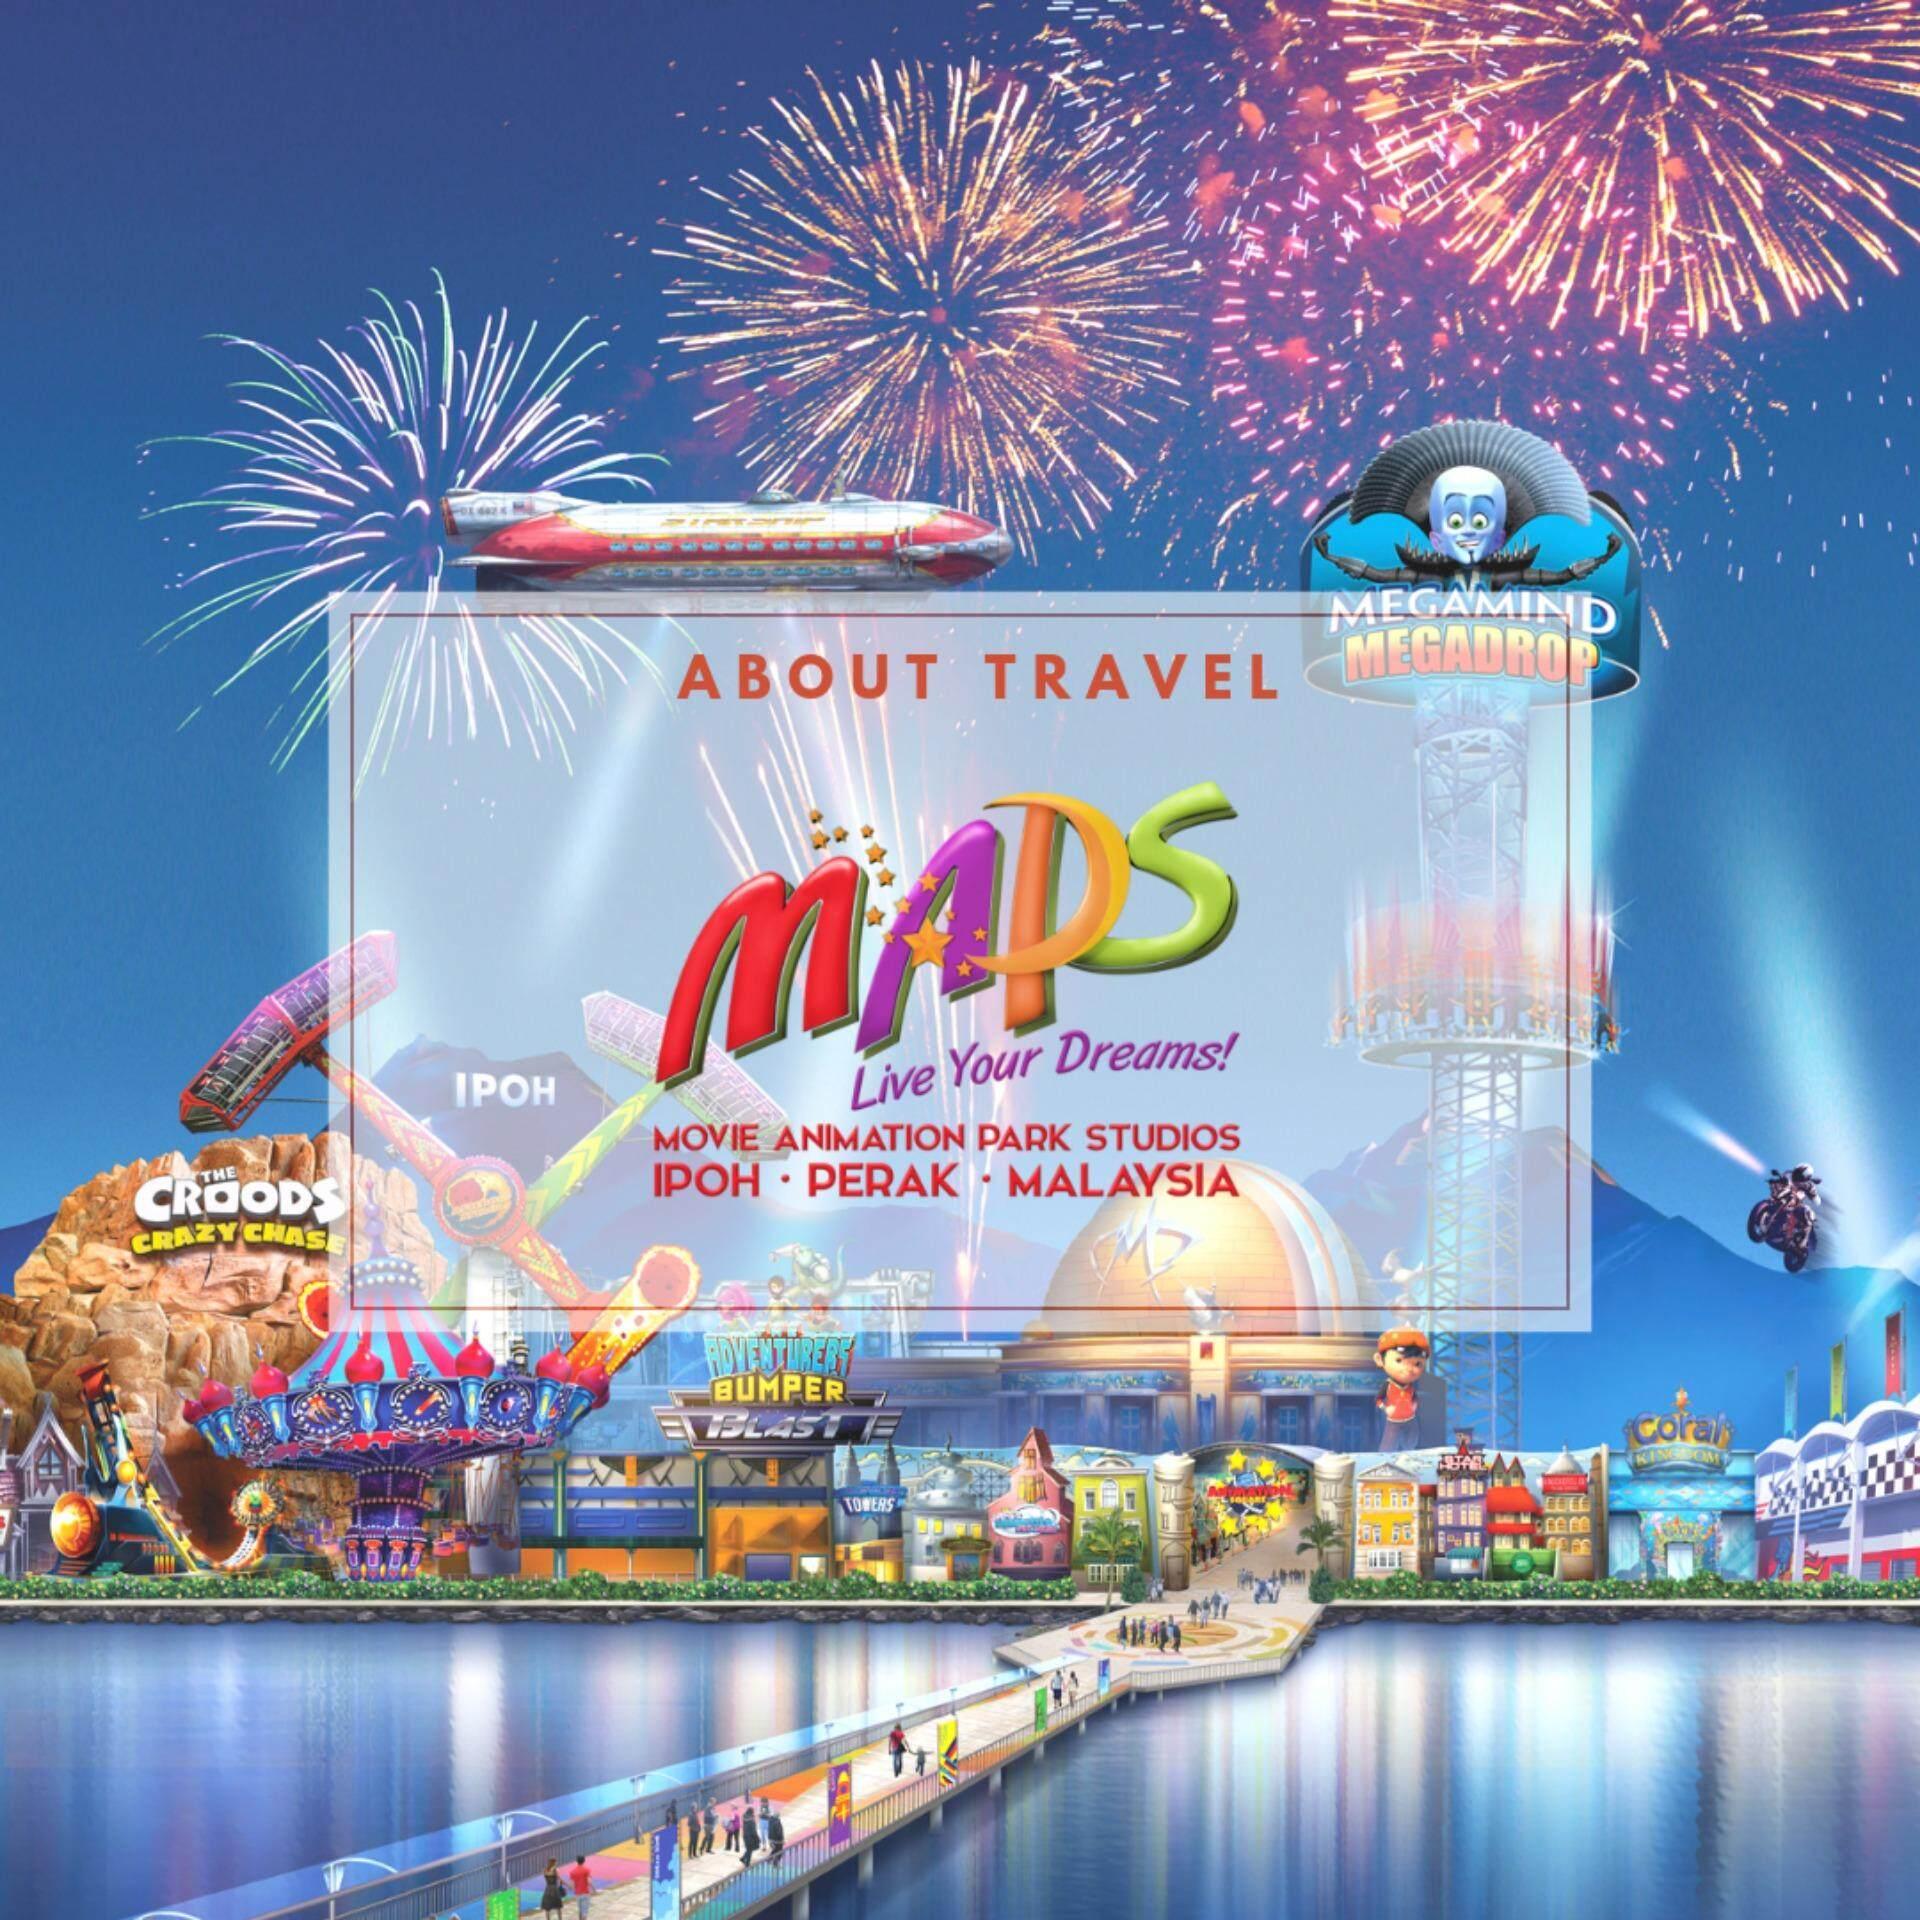 Perak : MAPS Movie Animation Park Studio 1 Day Pass - Adult